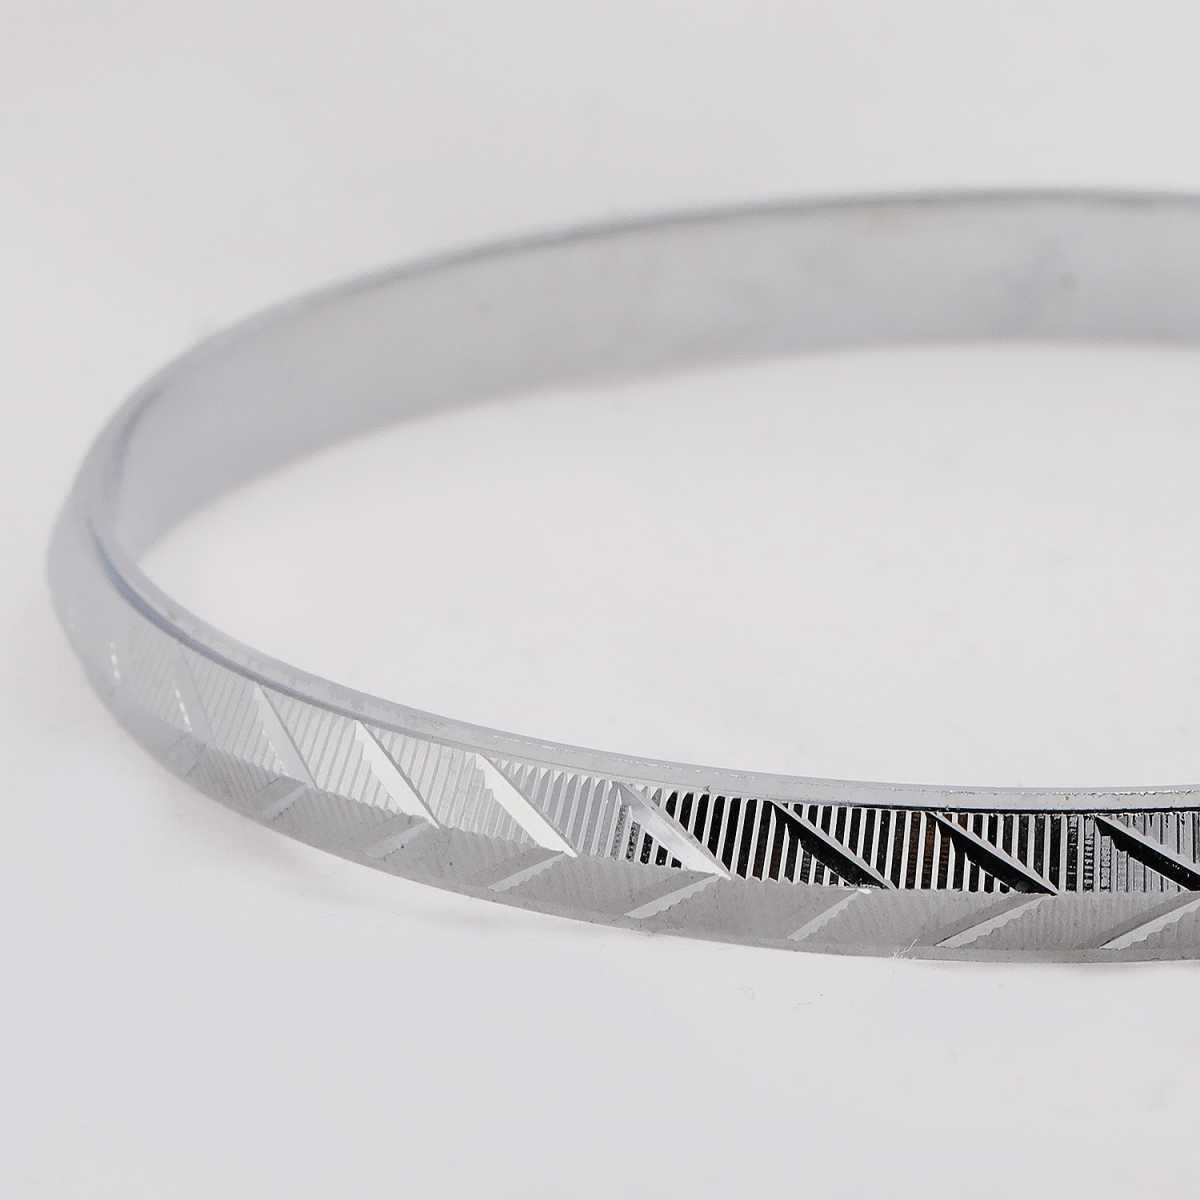 Silver Shine Silver Plated Cross Design  Punjabi Kada Bangle Bracelet For Boys and Mens.